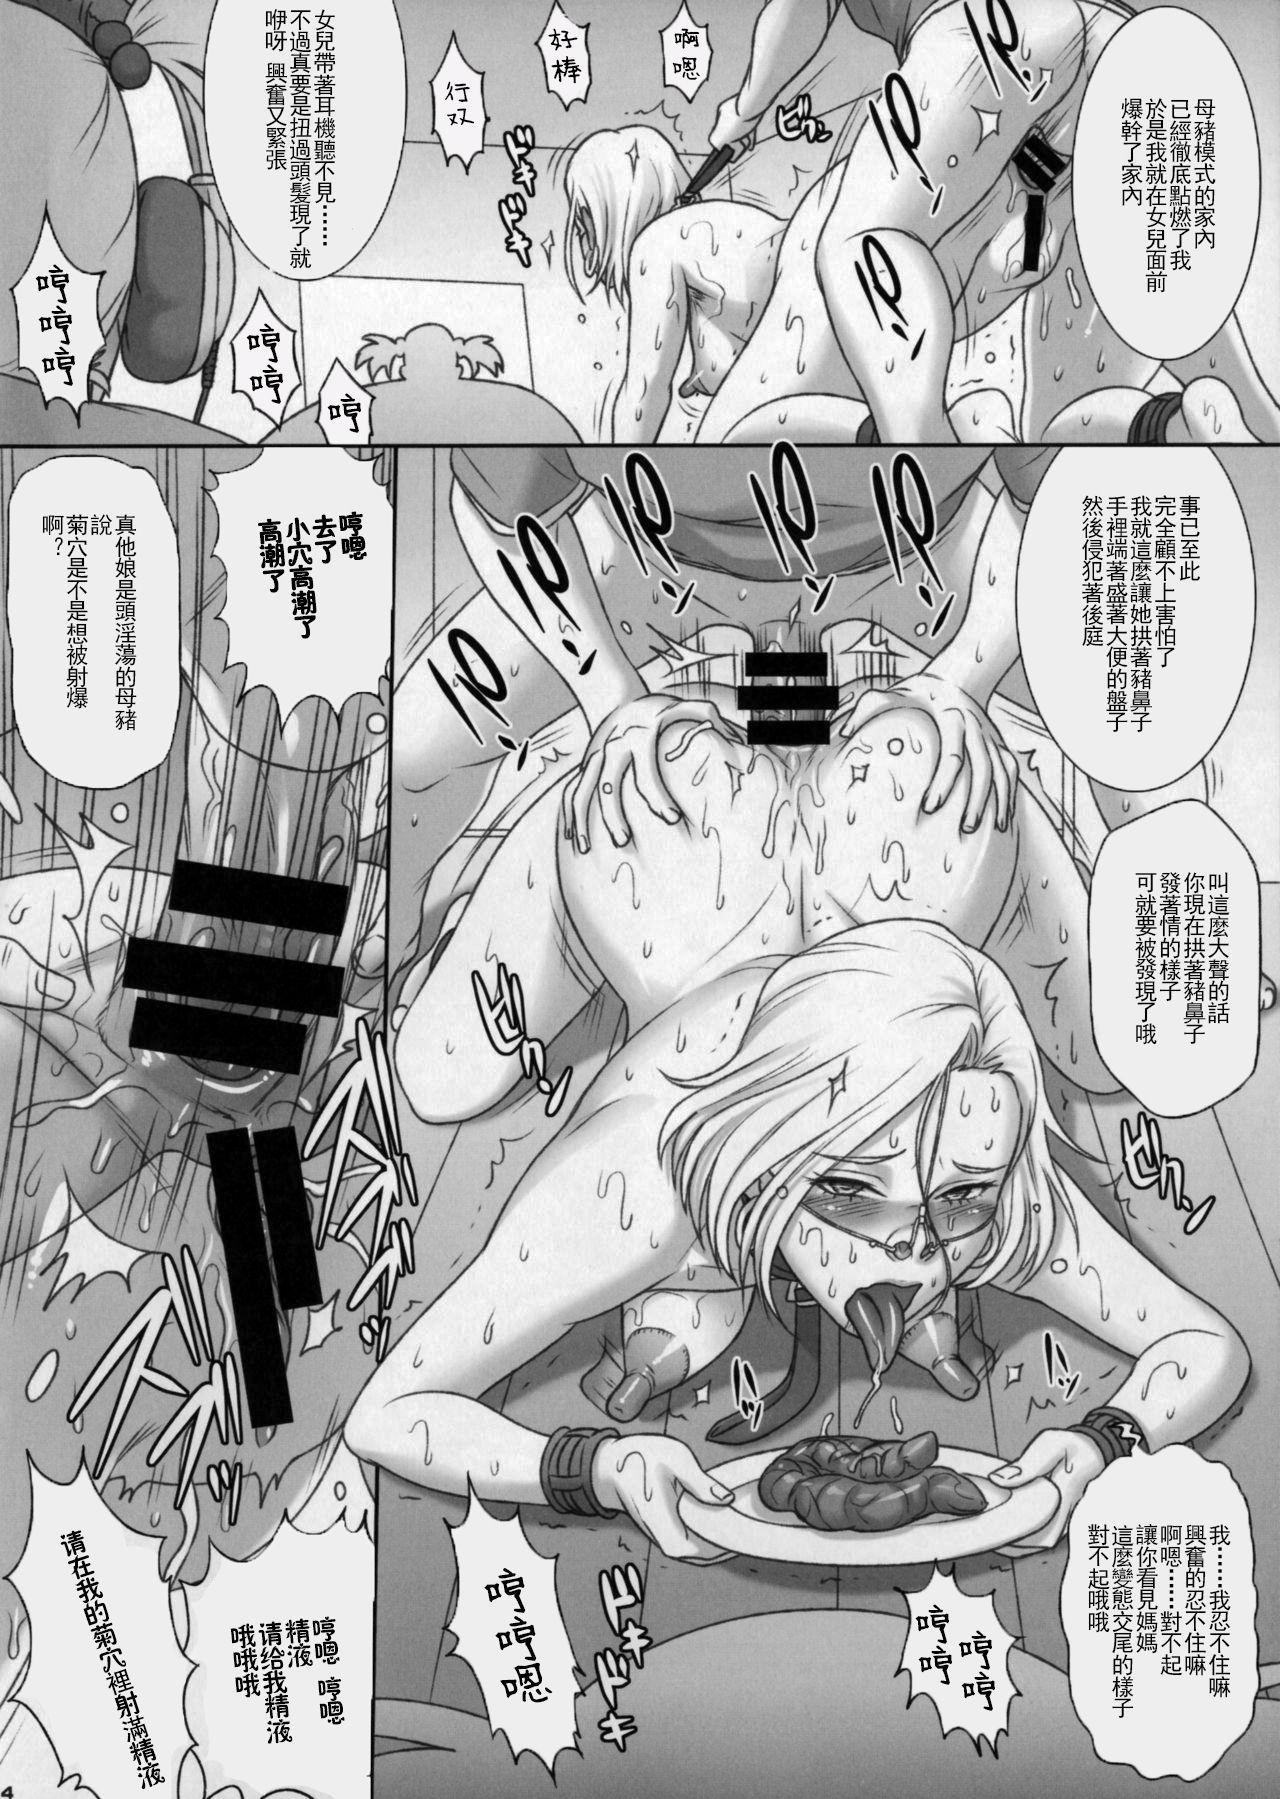 (C91) [Niku Ringo (Kakugari Kyoudai)] NIPPON NYAN NYAN BALL Z (Dragon Ball Z)[Chinese]【不可视汉化】 14